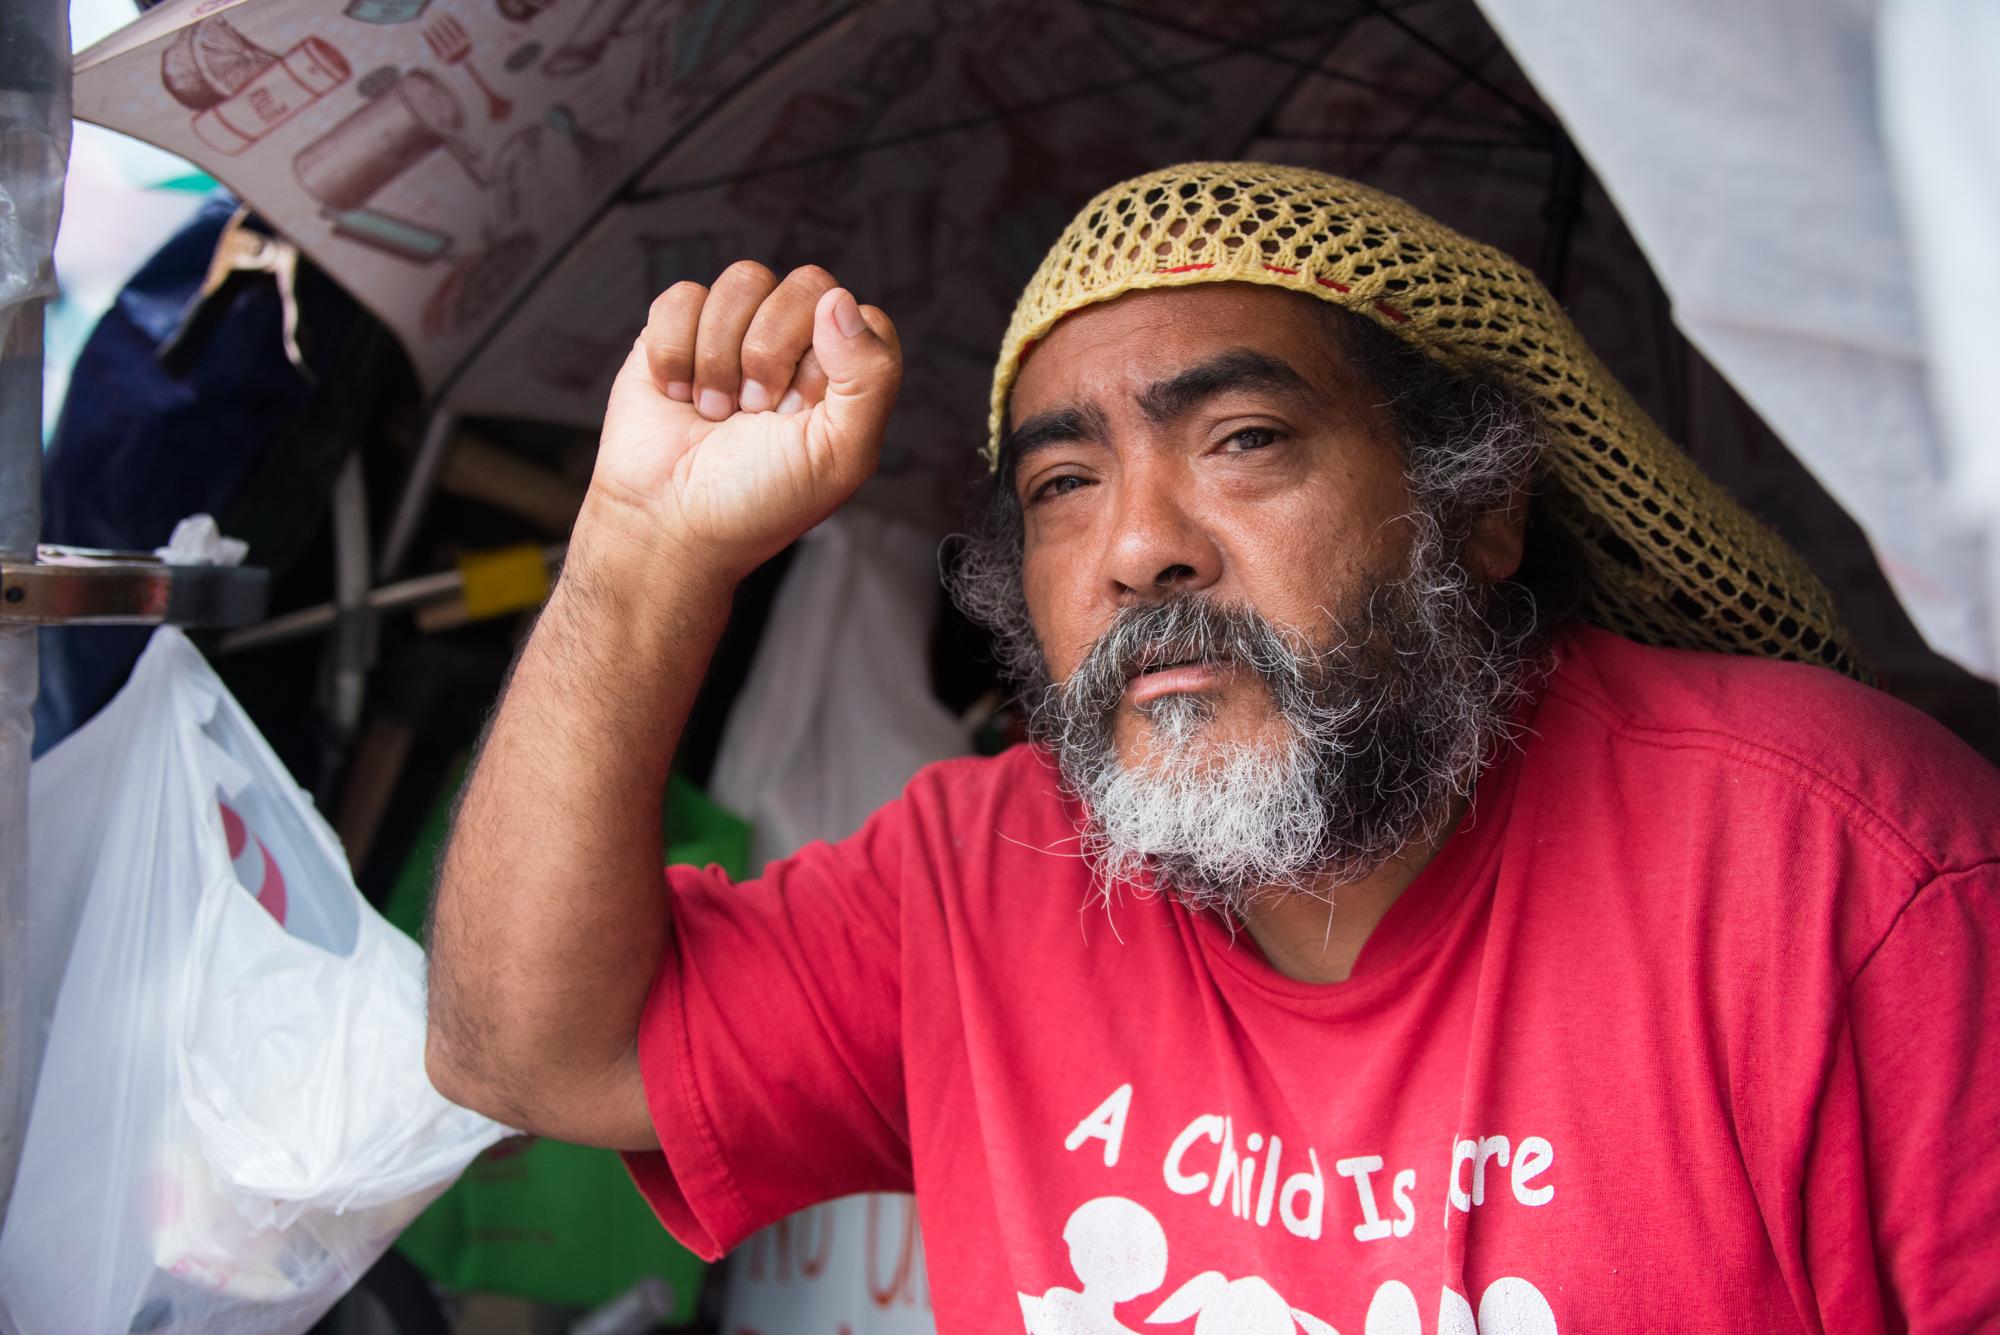 Philipos Melaku-Bello, protester and custodian of the peace vigil outside the White House.